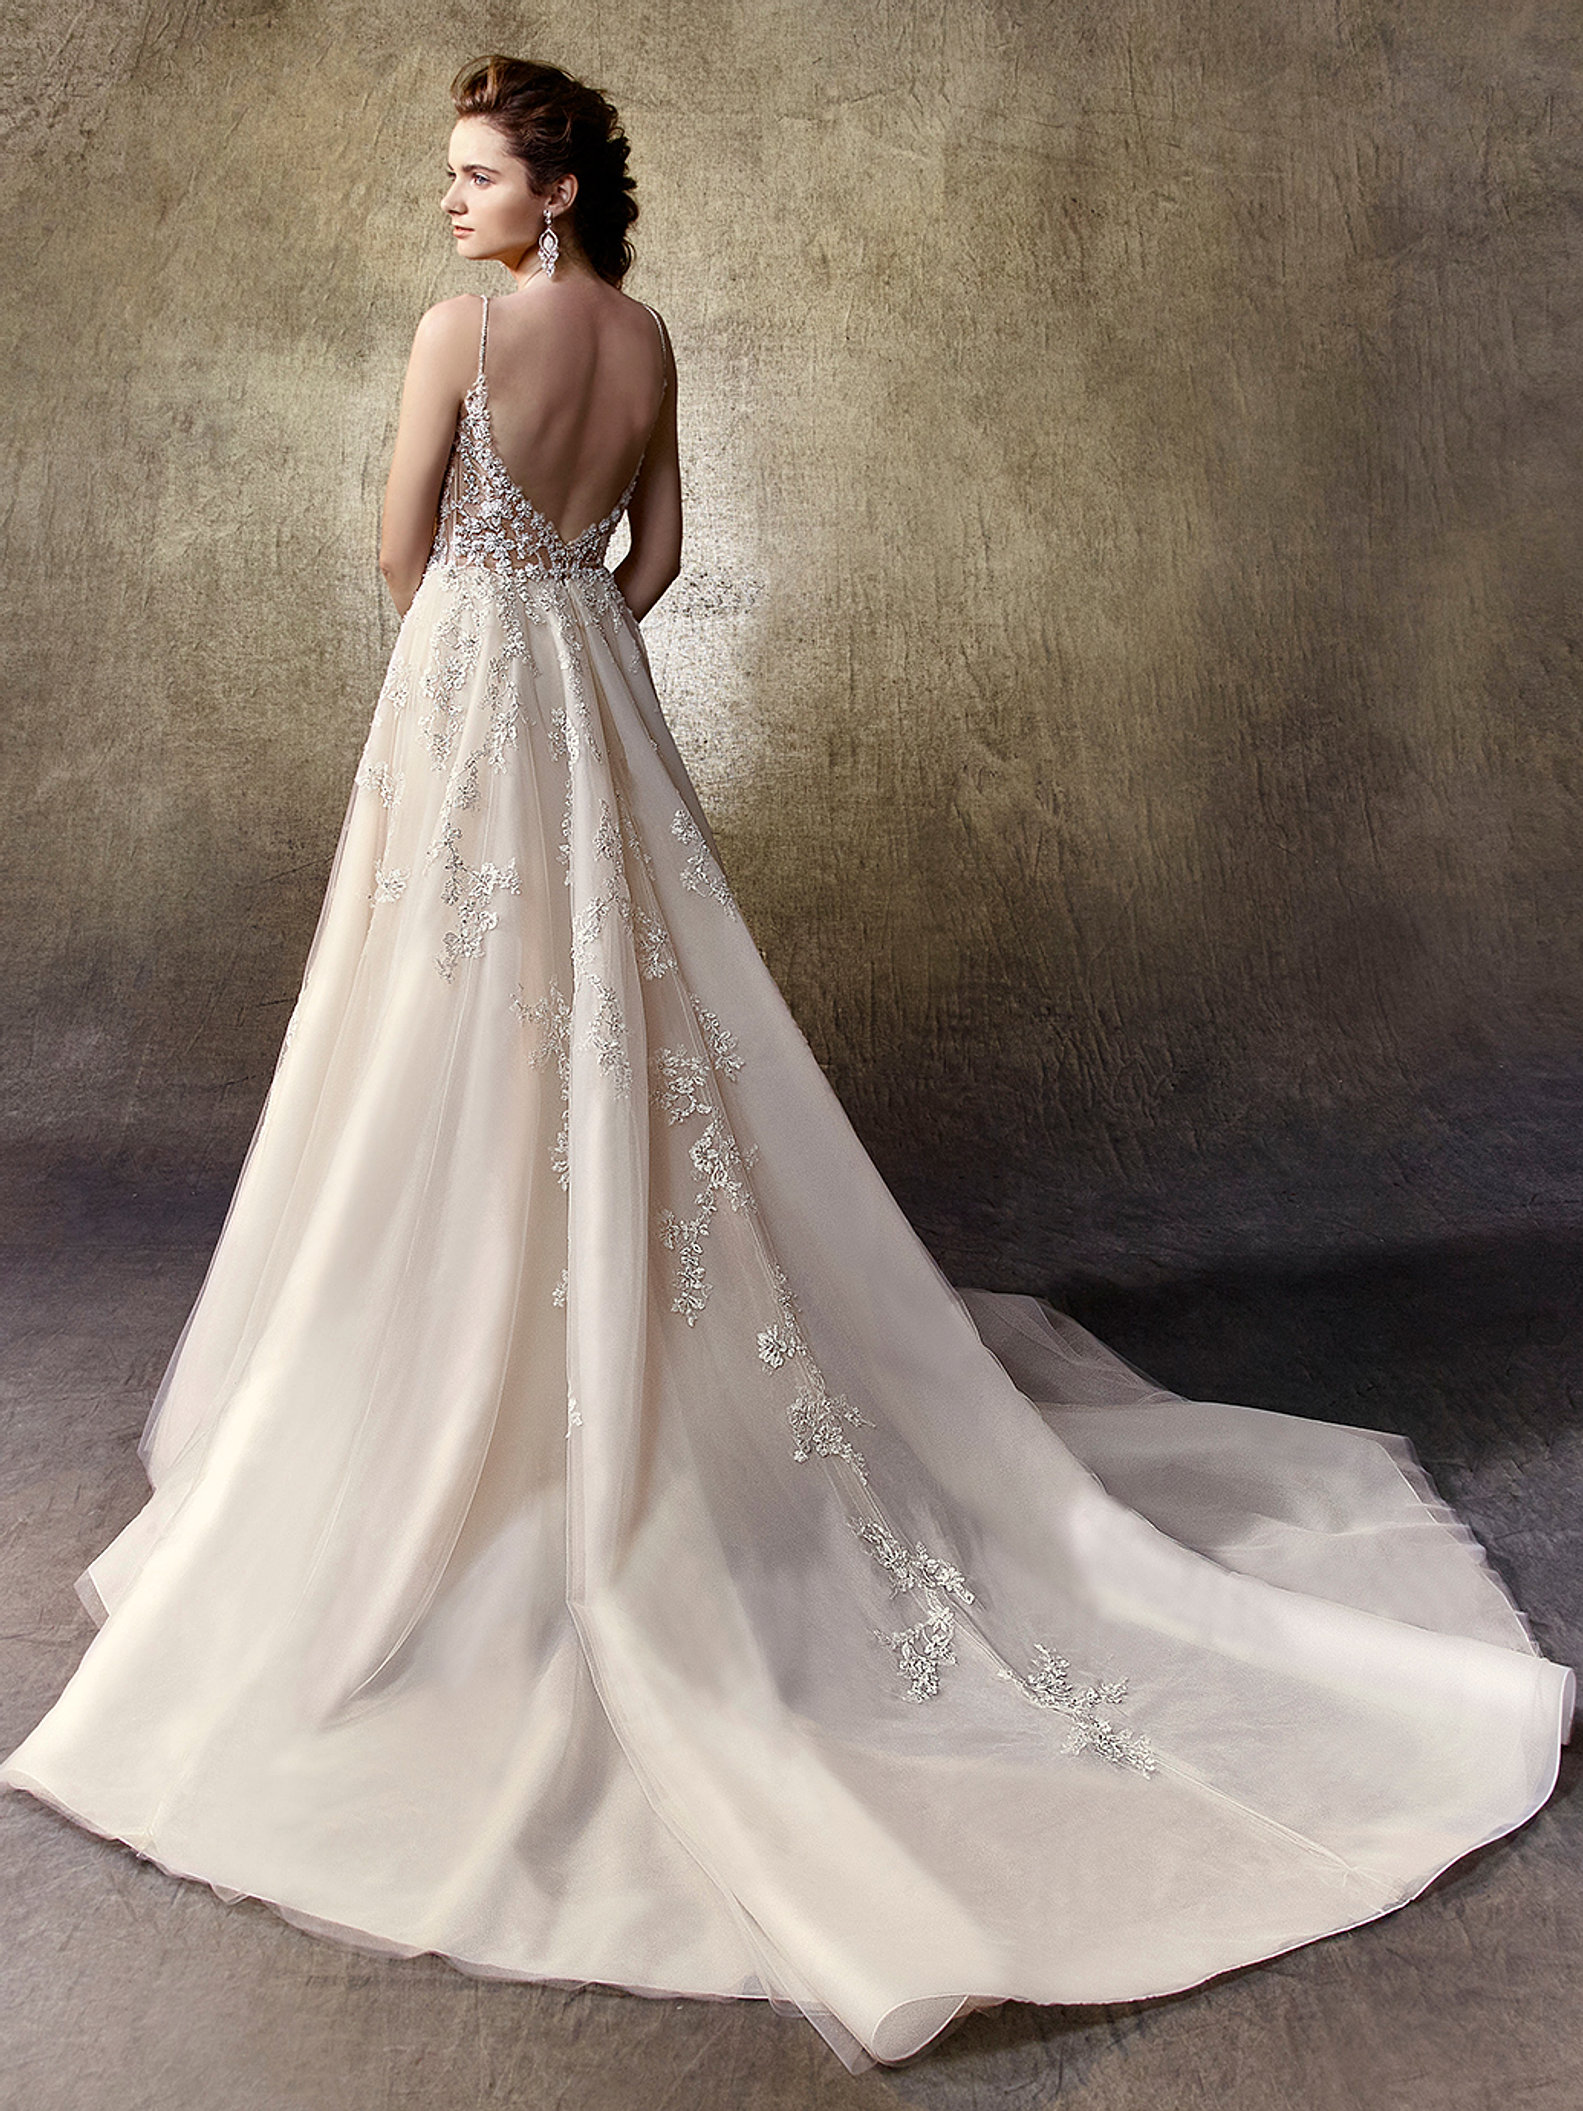 Abendkleider ilse moden bremen  Abendkleider beliebte Modelle